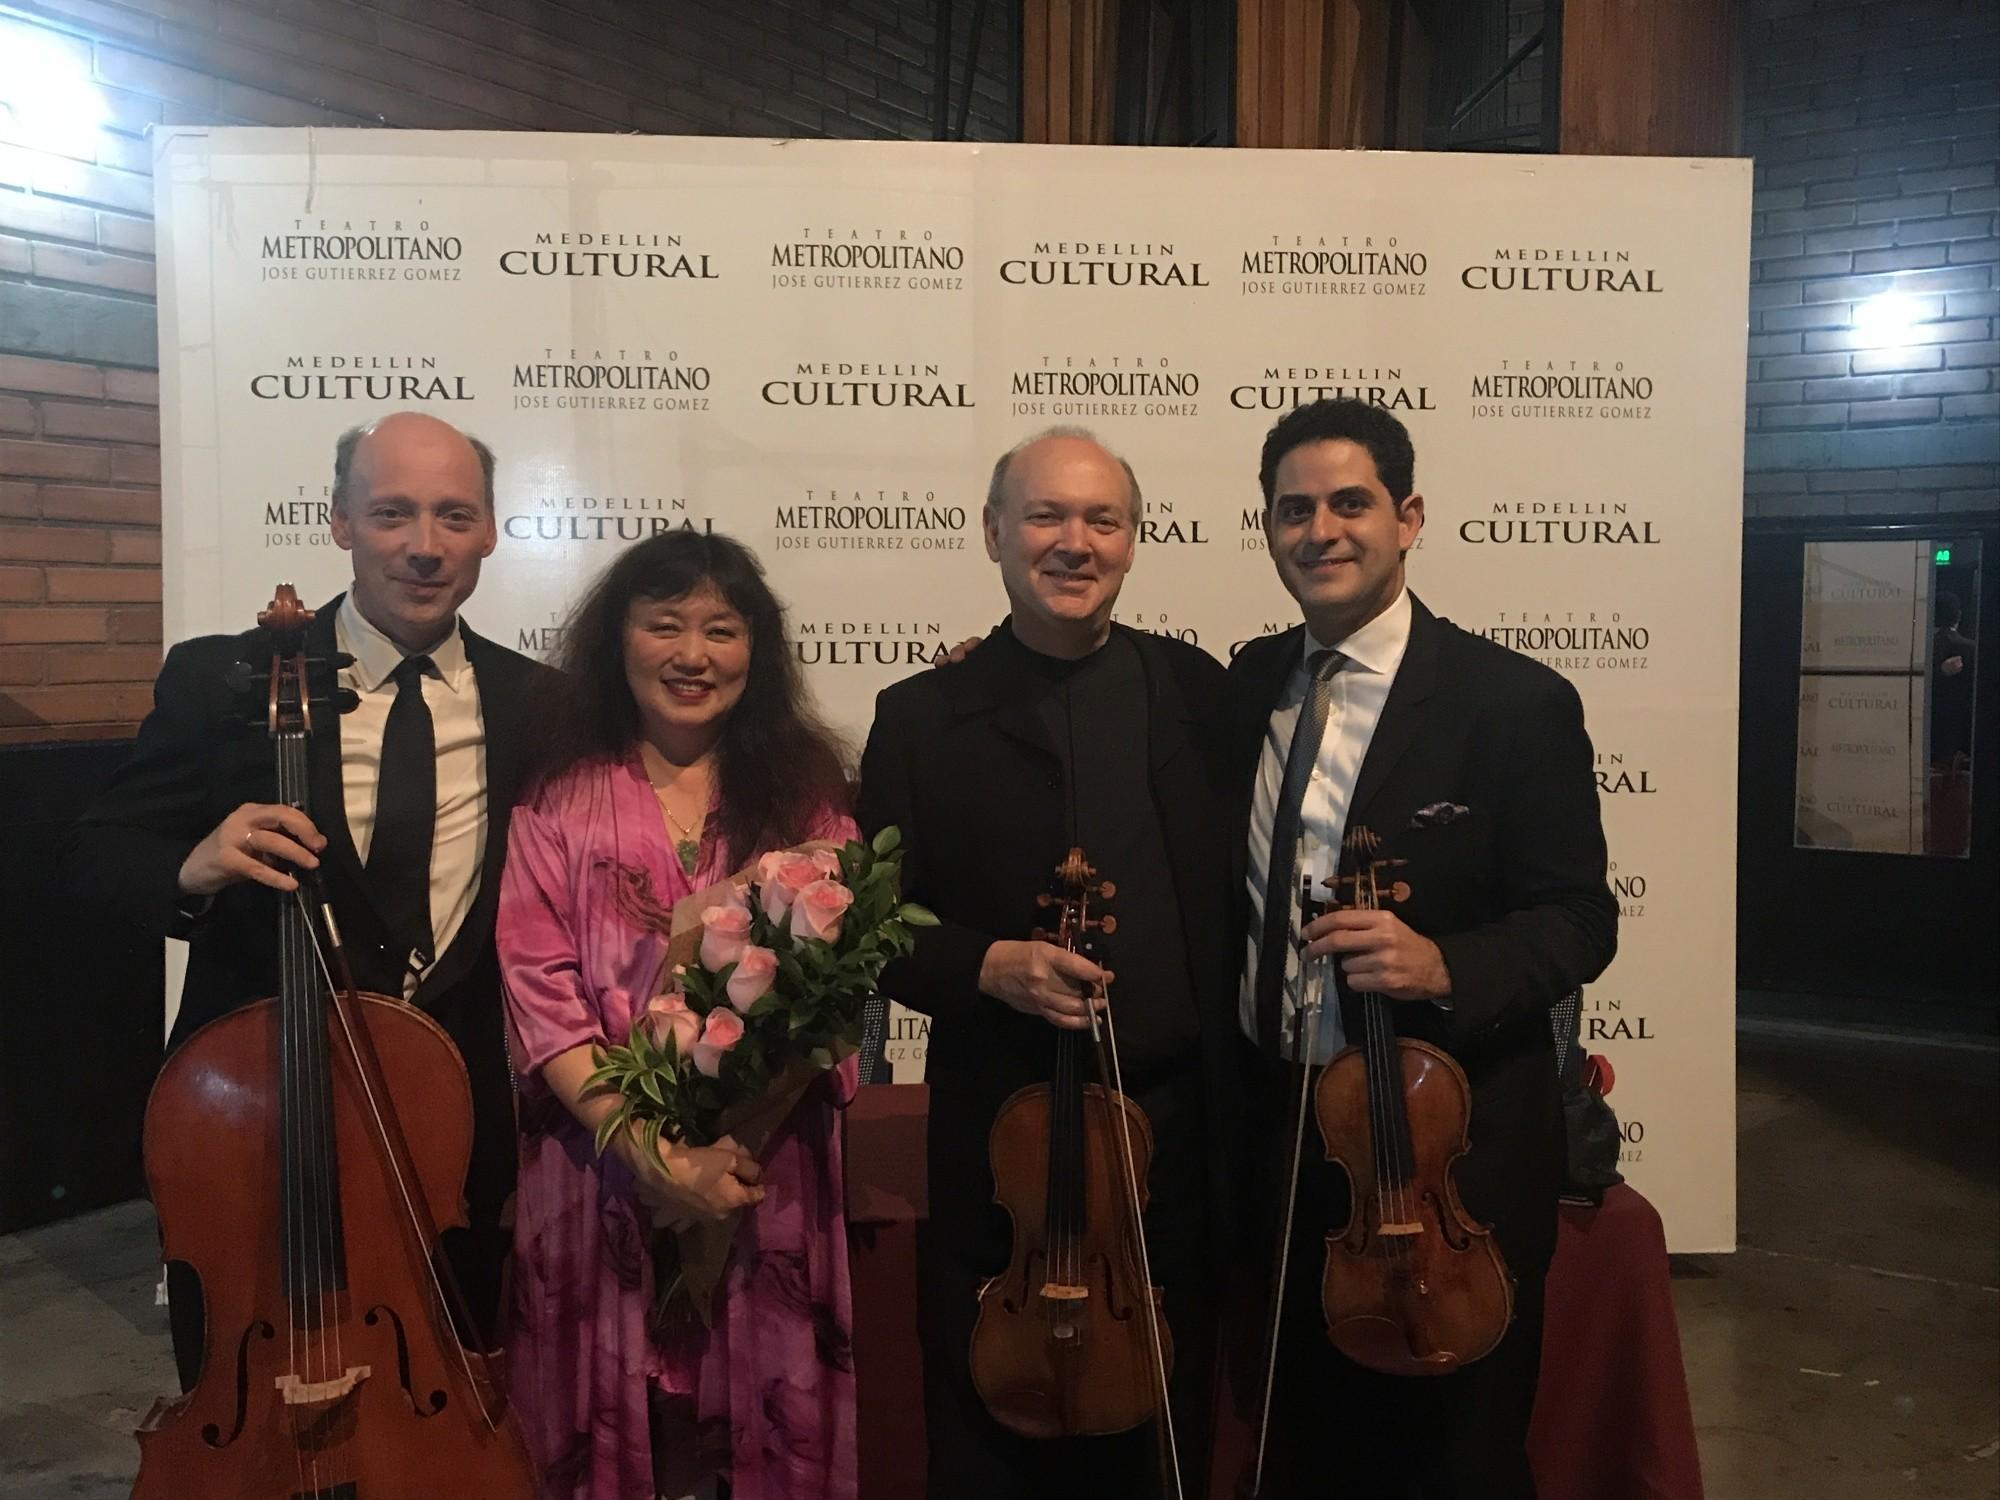 Clive Greensmith, Wu Han, Paul Neubauer, Arnaud Sussmann